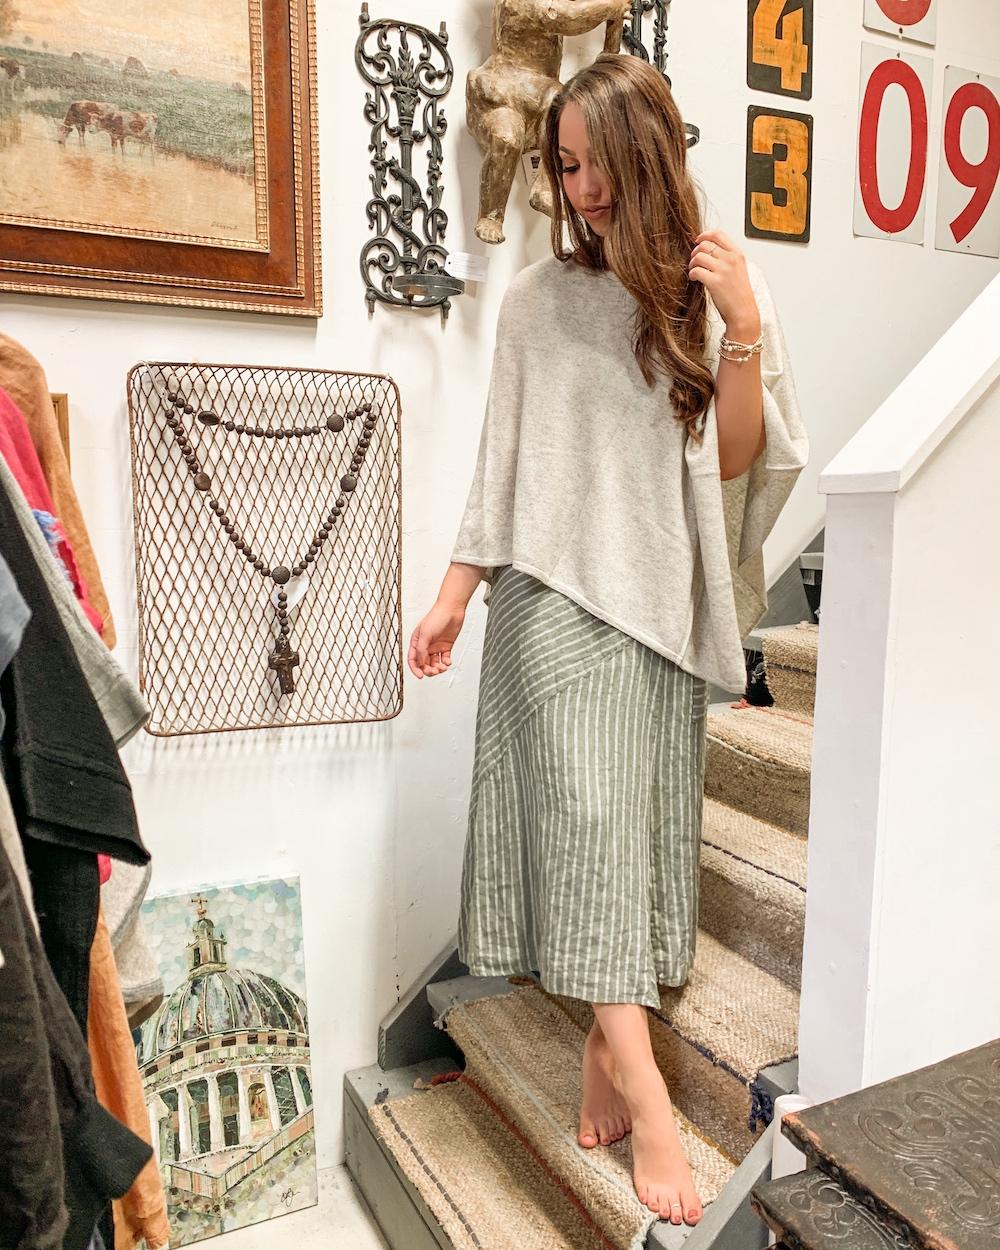 clothing boutique costa mesa